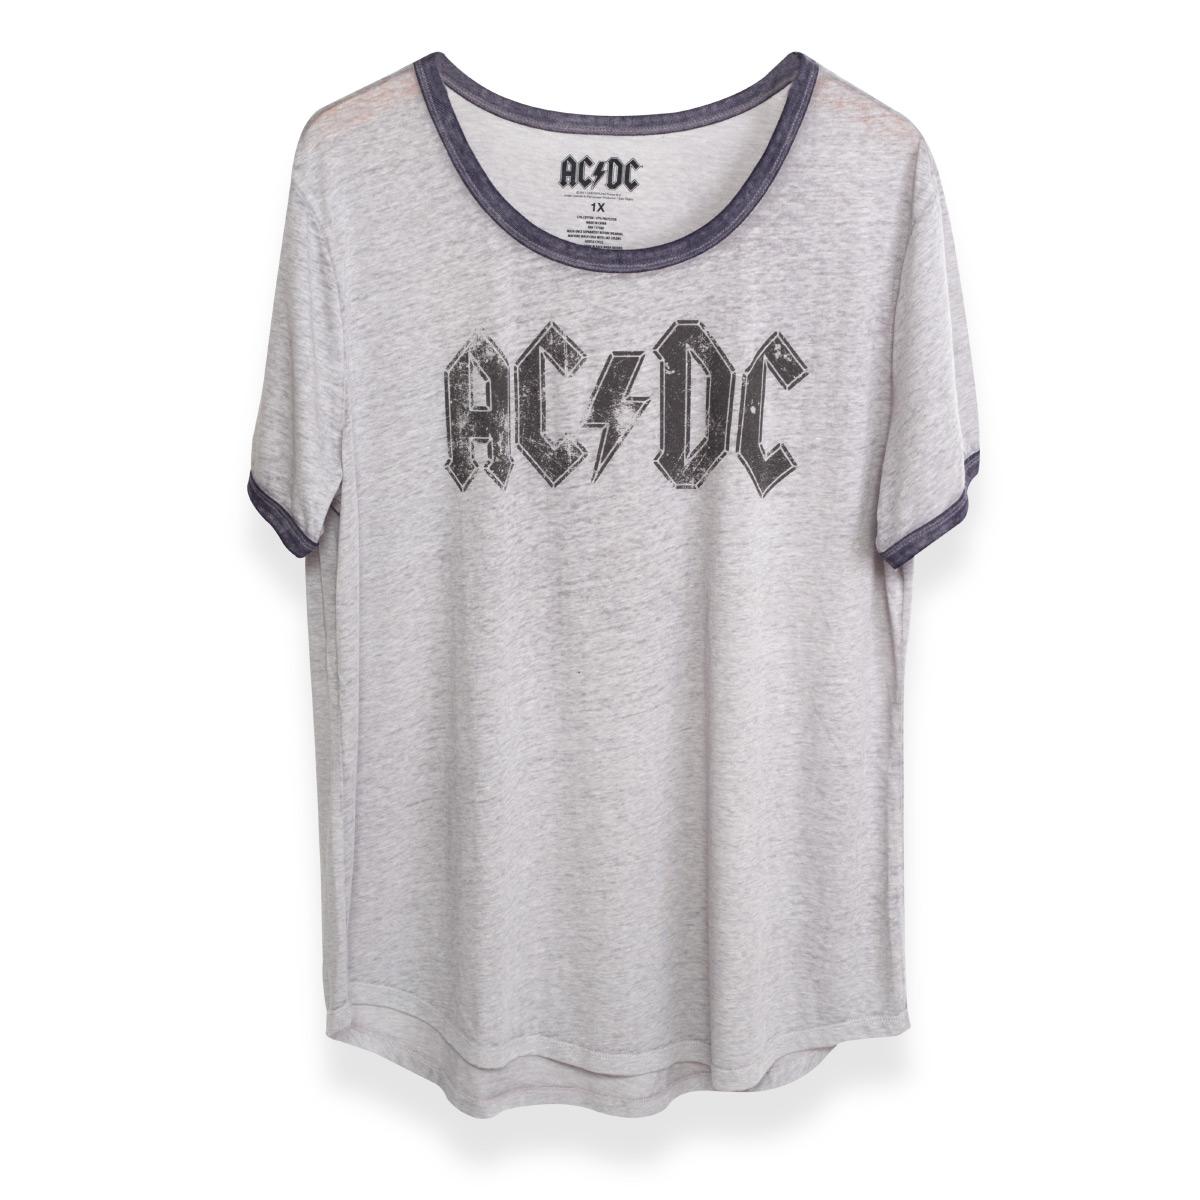 AC/DC Black Logo Grey Women's T-Shirt